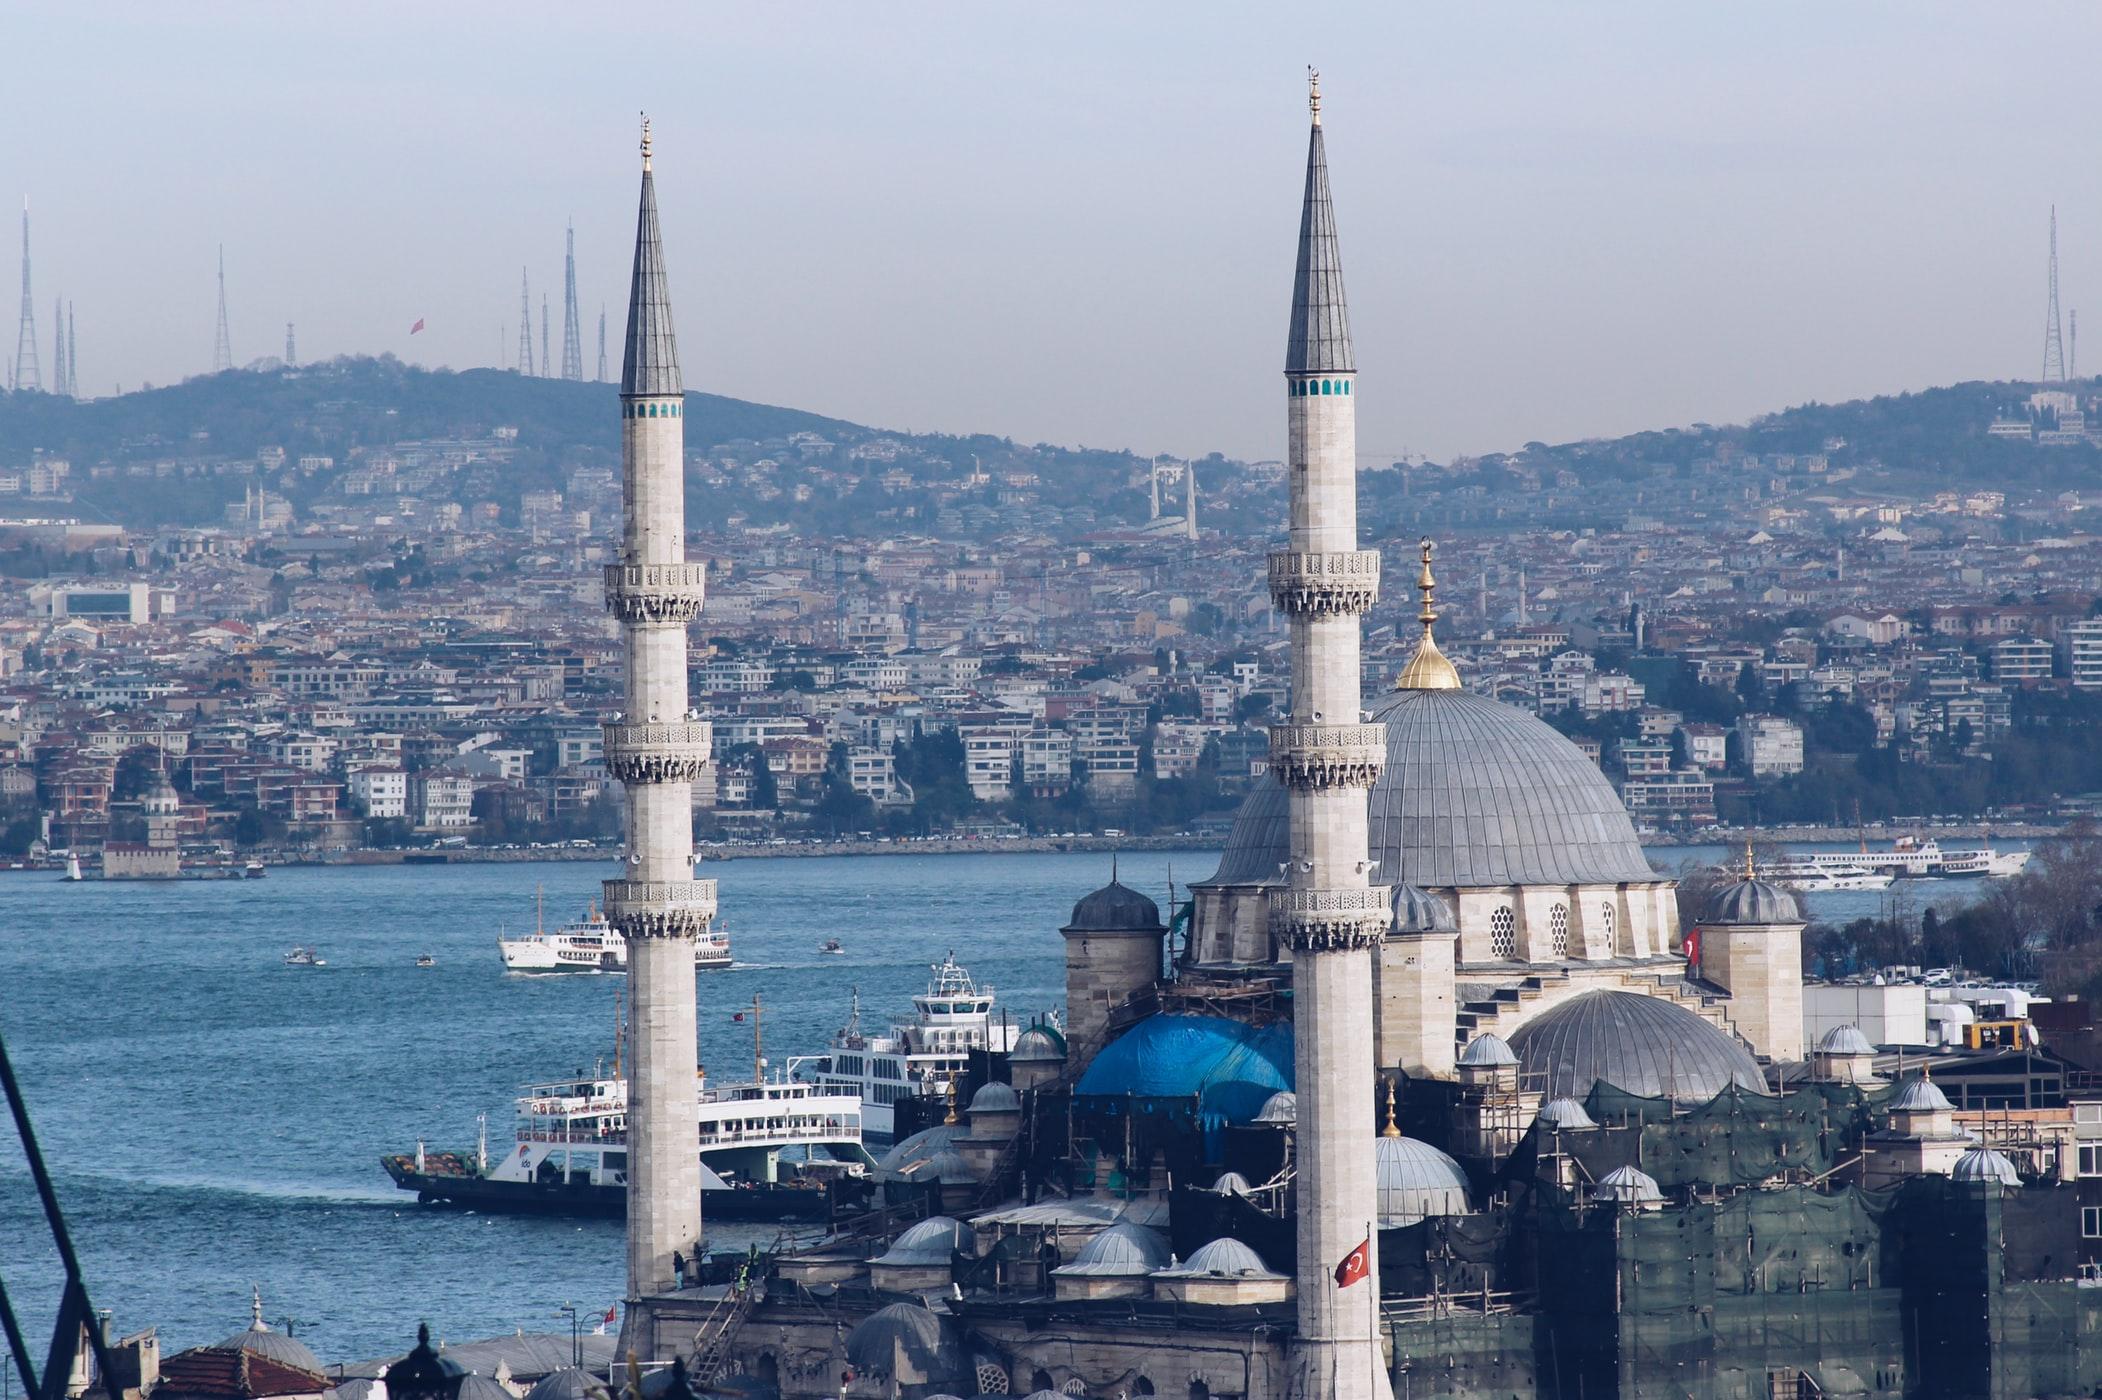 atr-turchia-dizionario